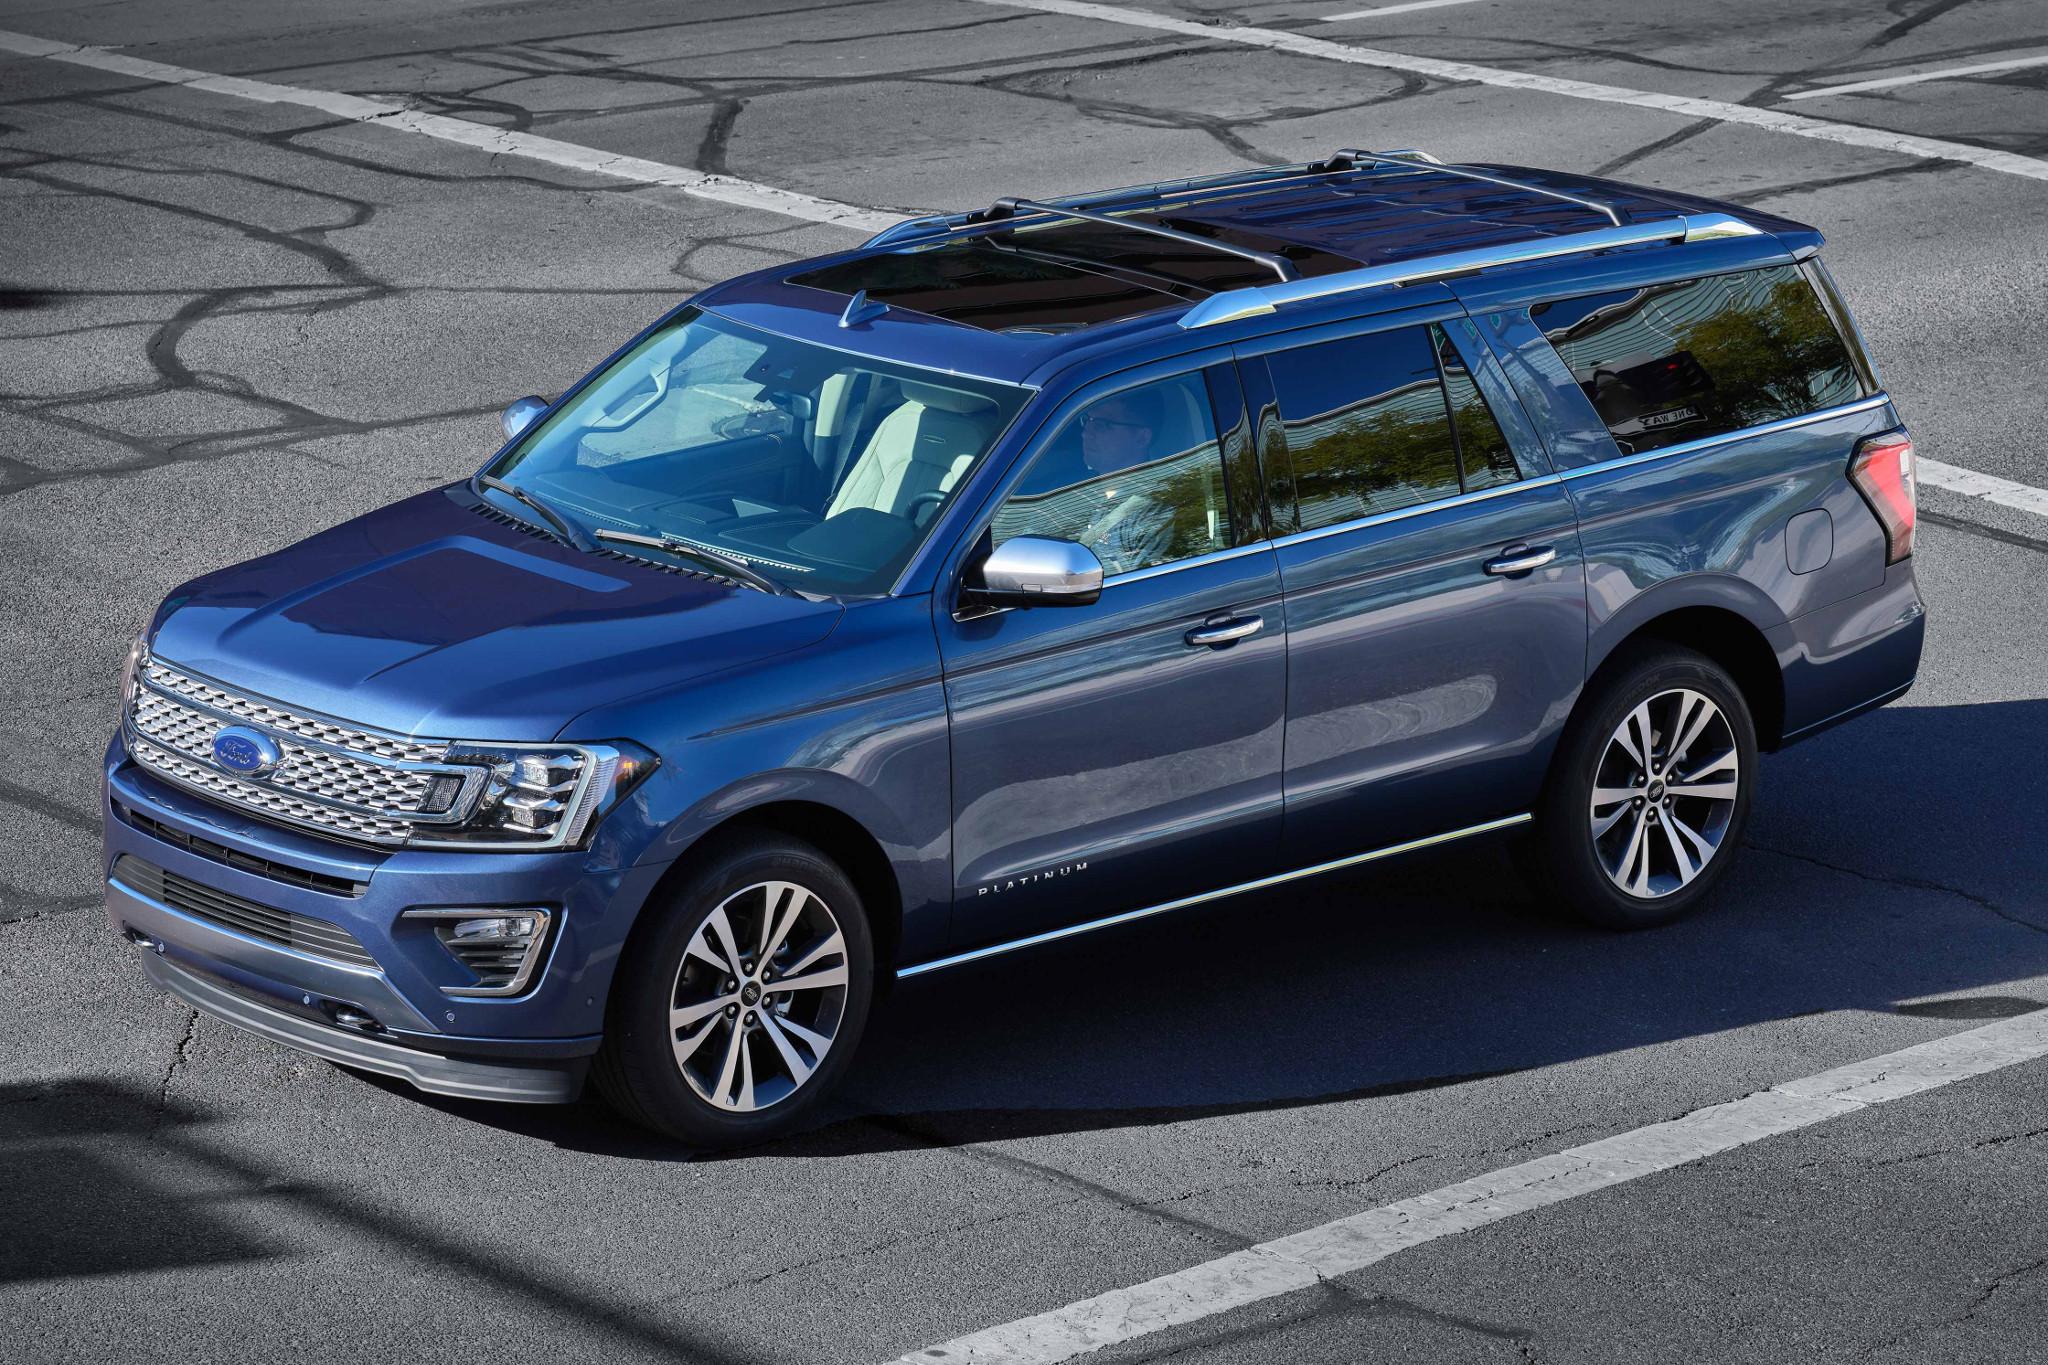 2020 Family Car of the Year via @carsdotcom